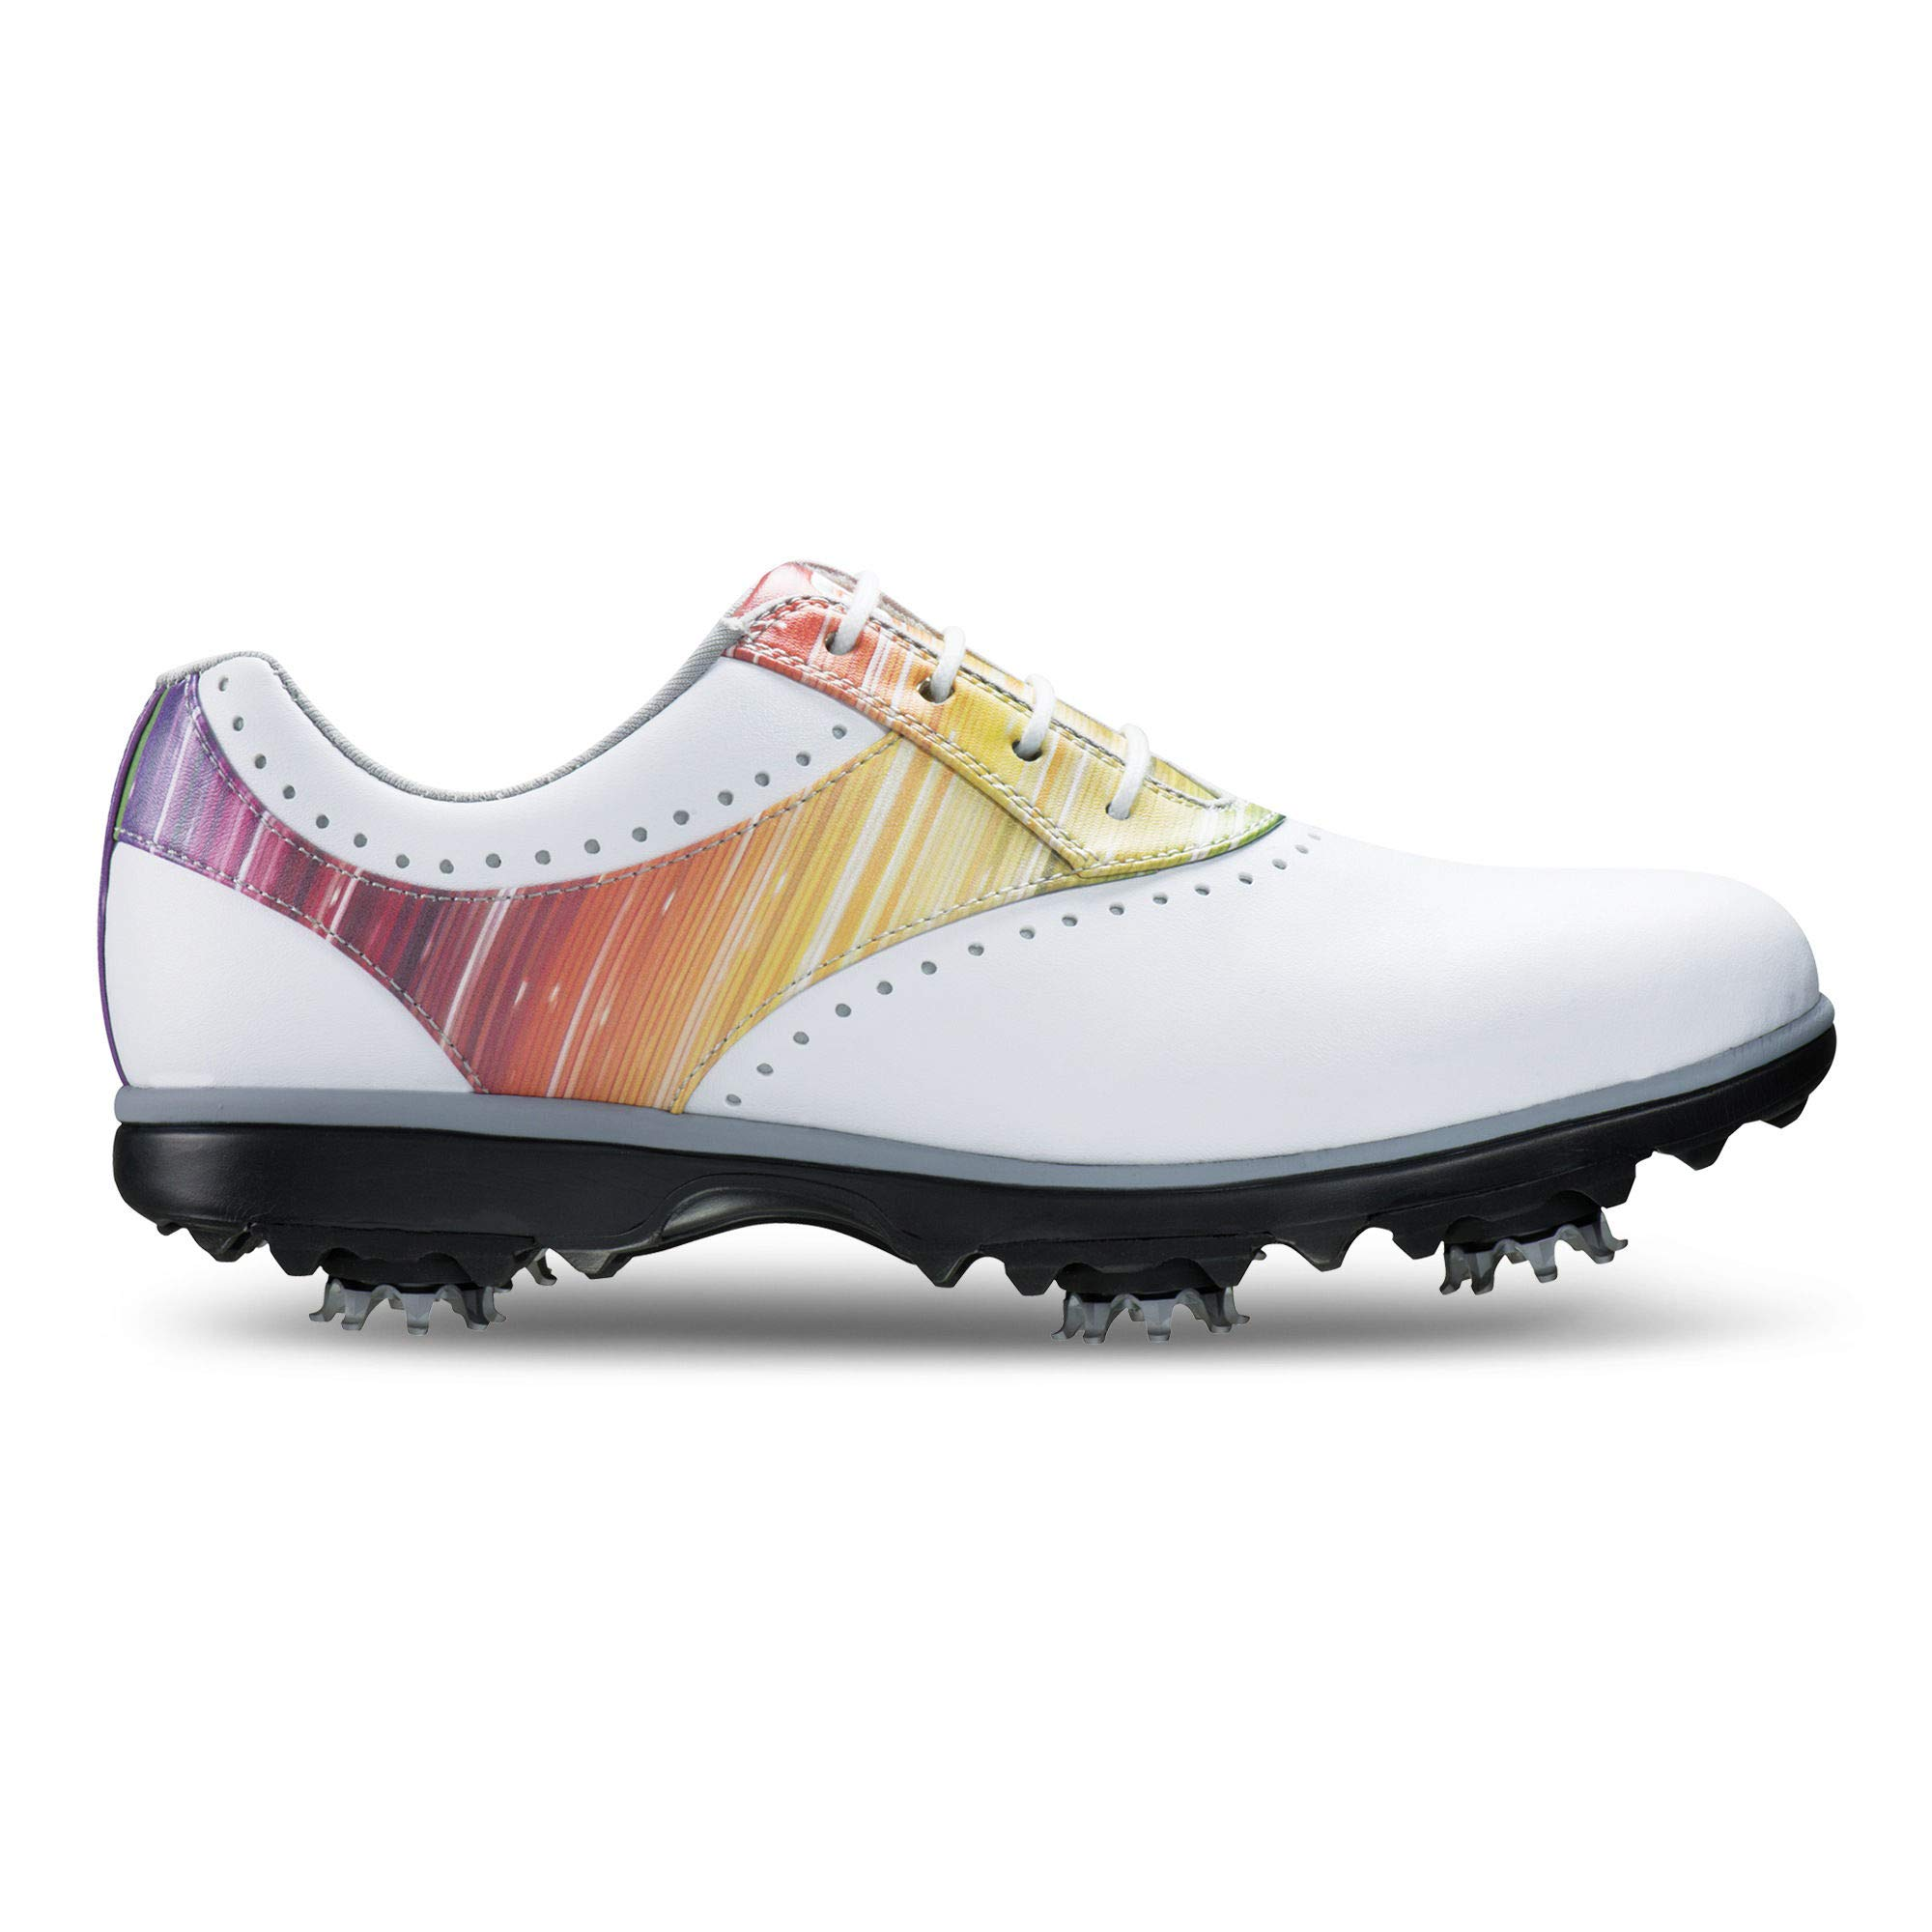 FootJoy Women's Emerge-Previous Season Style Golf Shoes White 6.5 M Rainbow, US by FootJoy